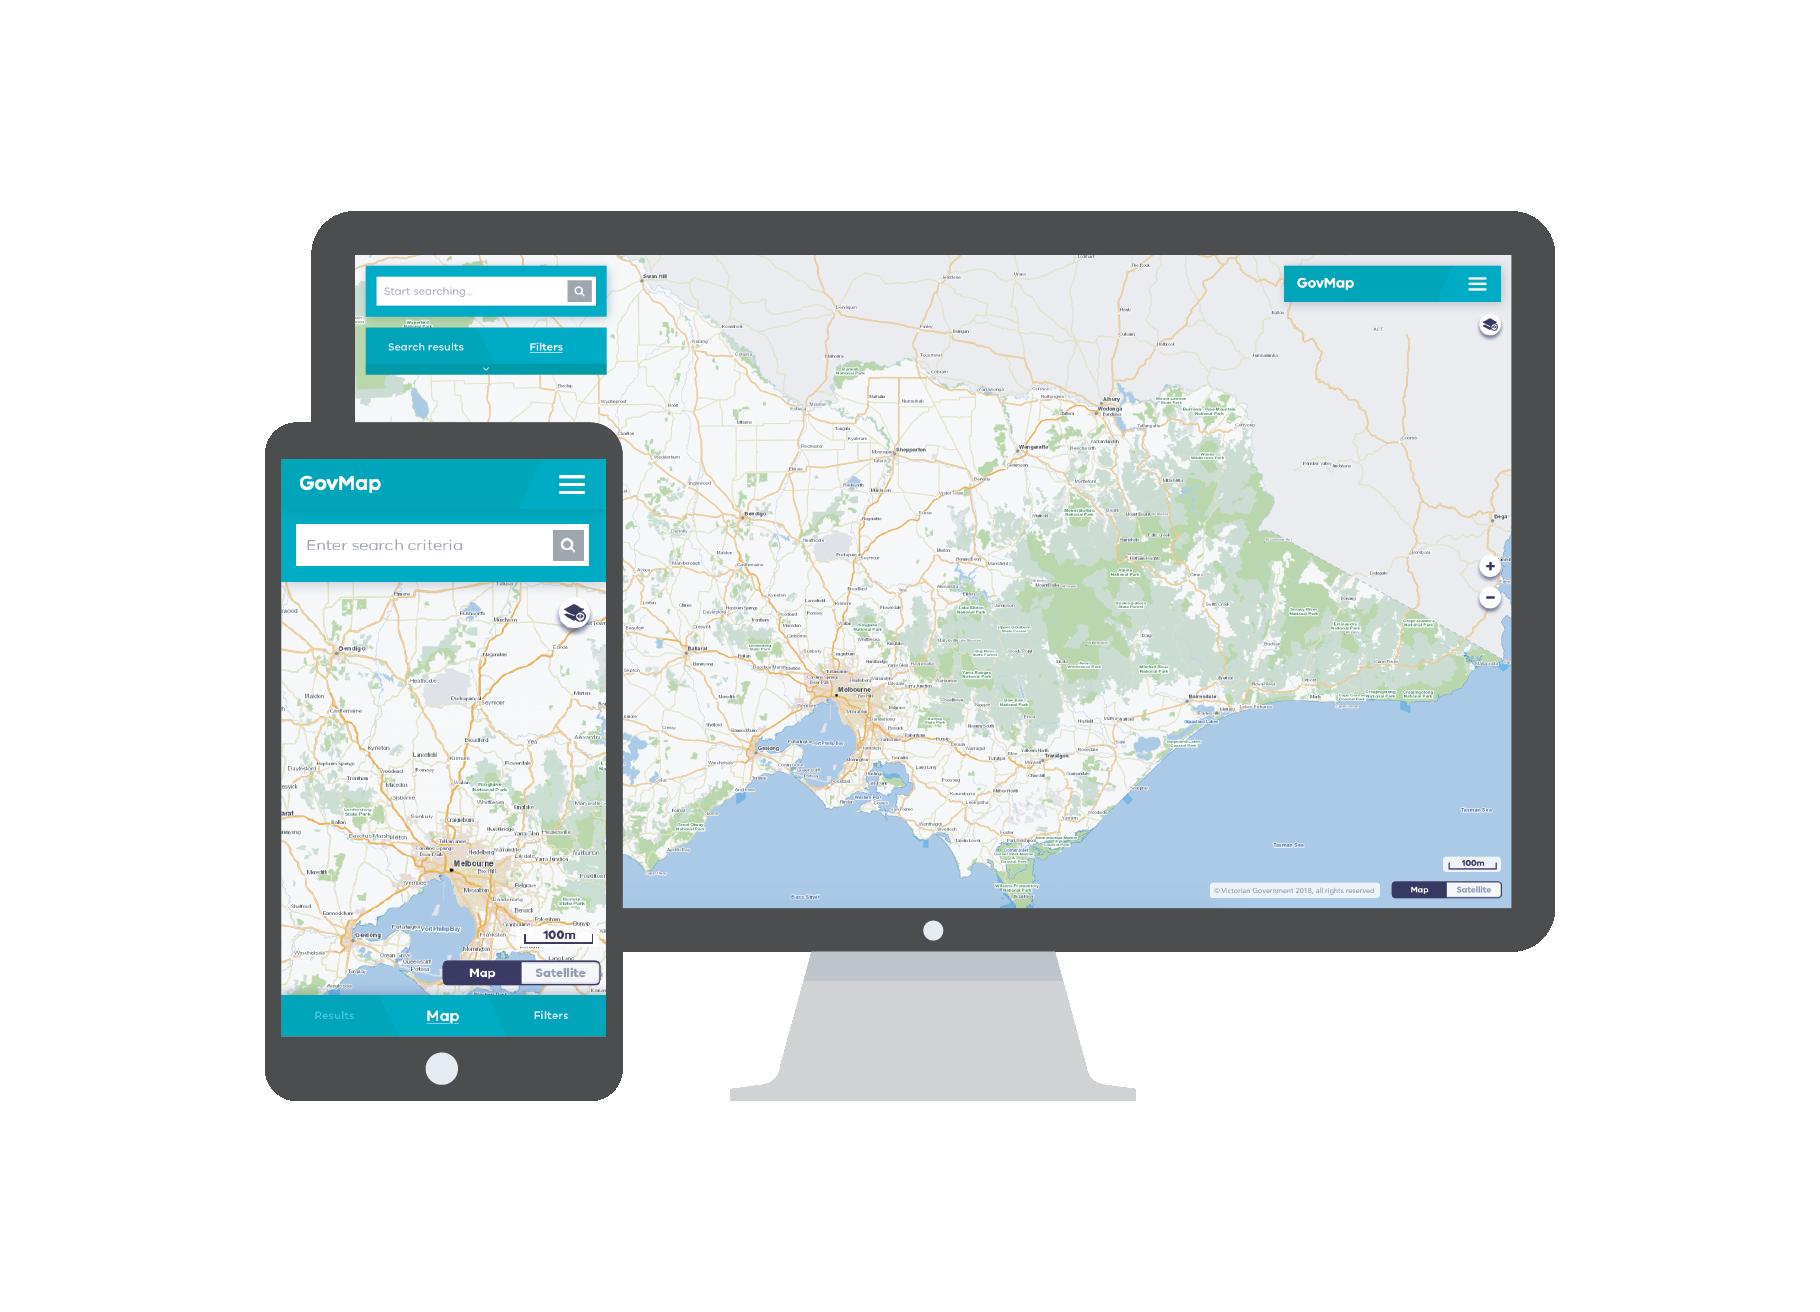 A desktop and smartphone screen showing govmap